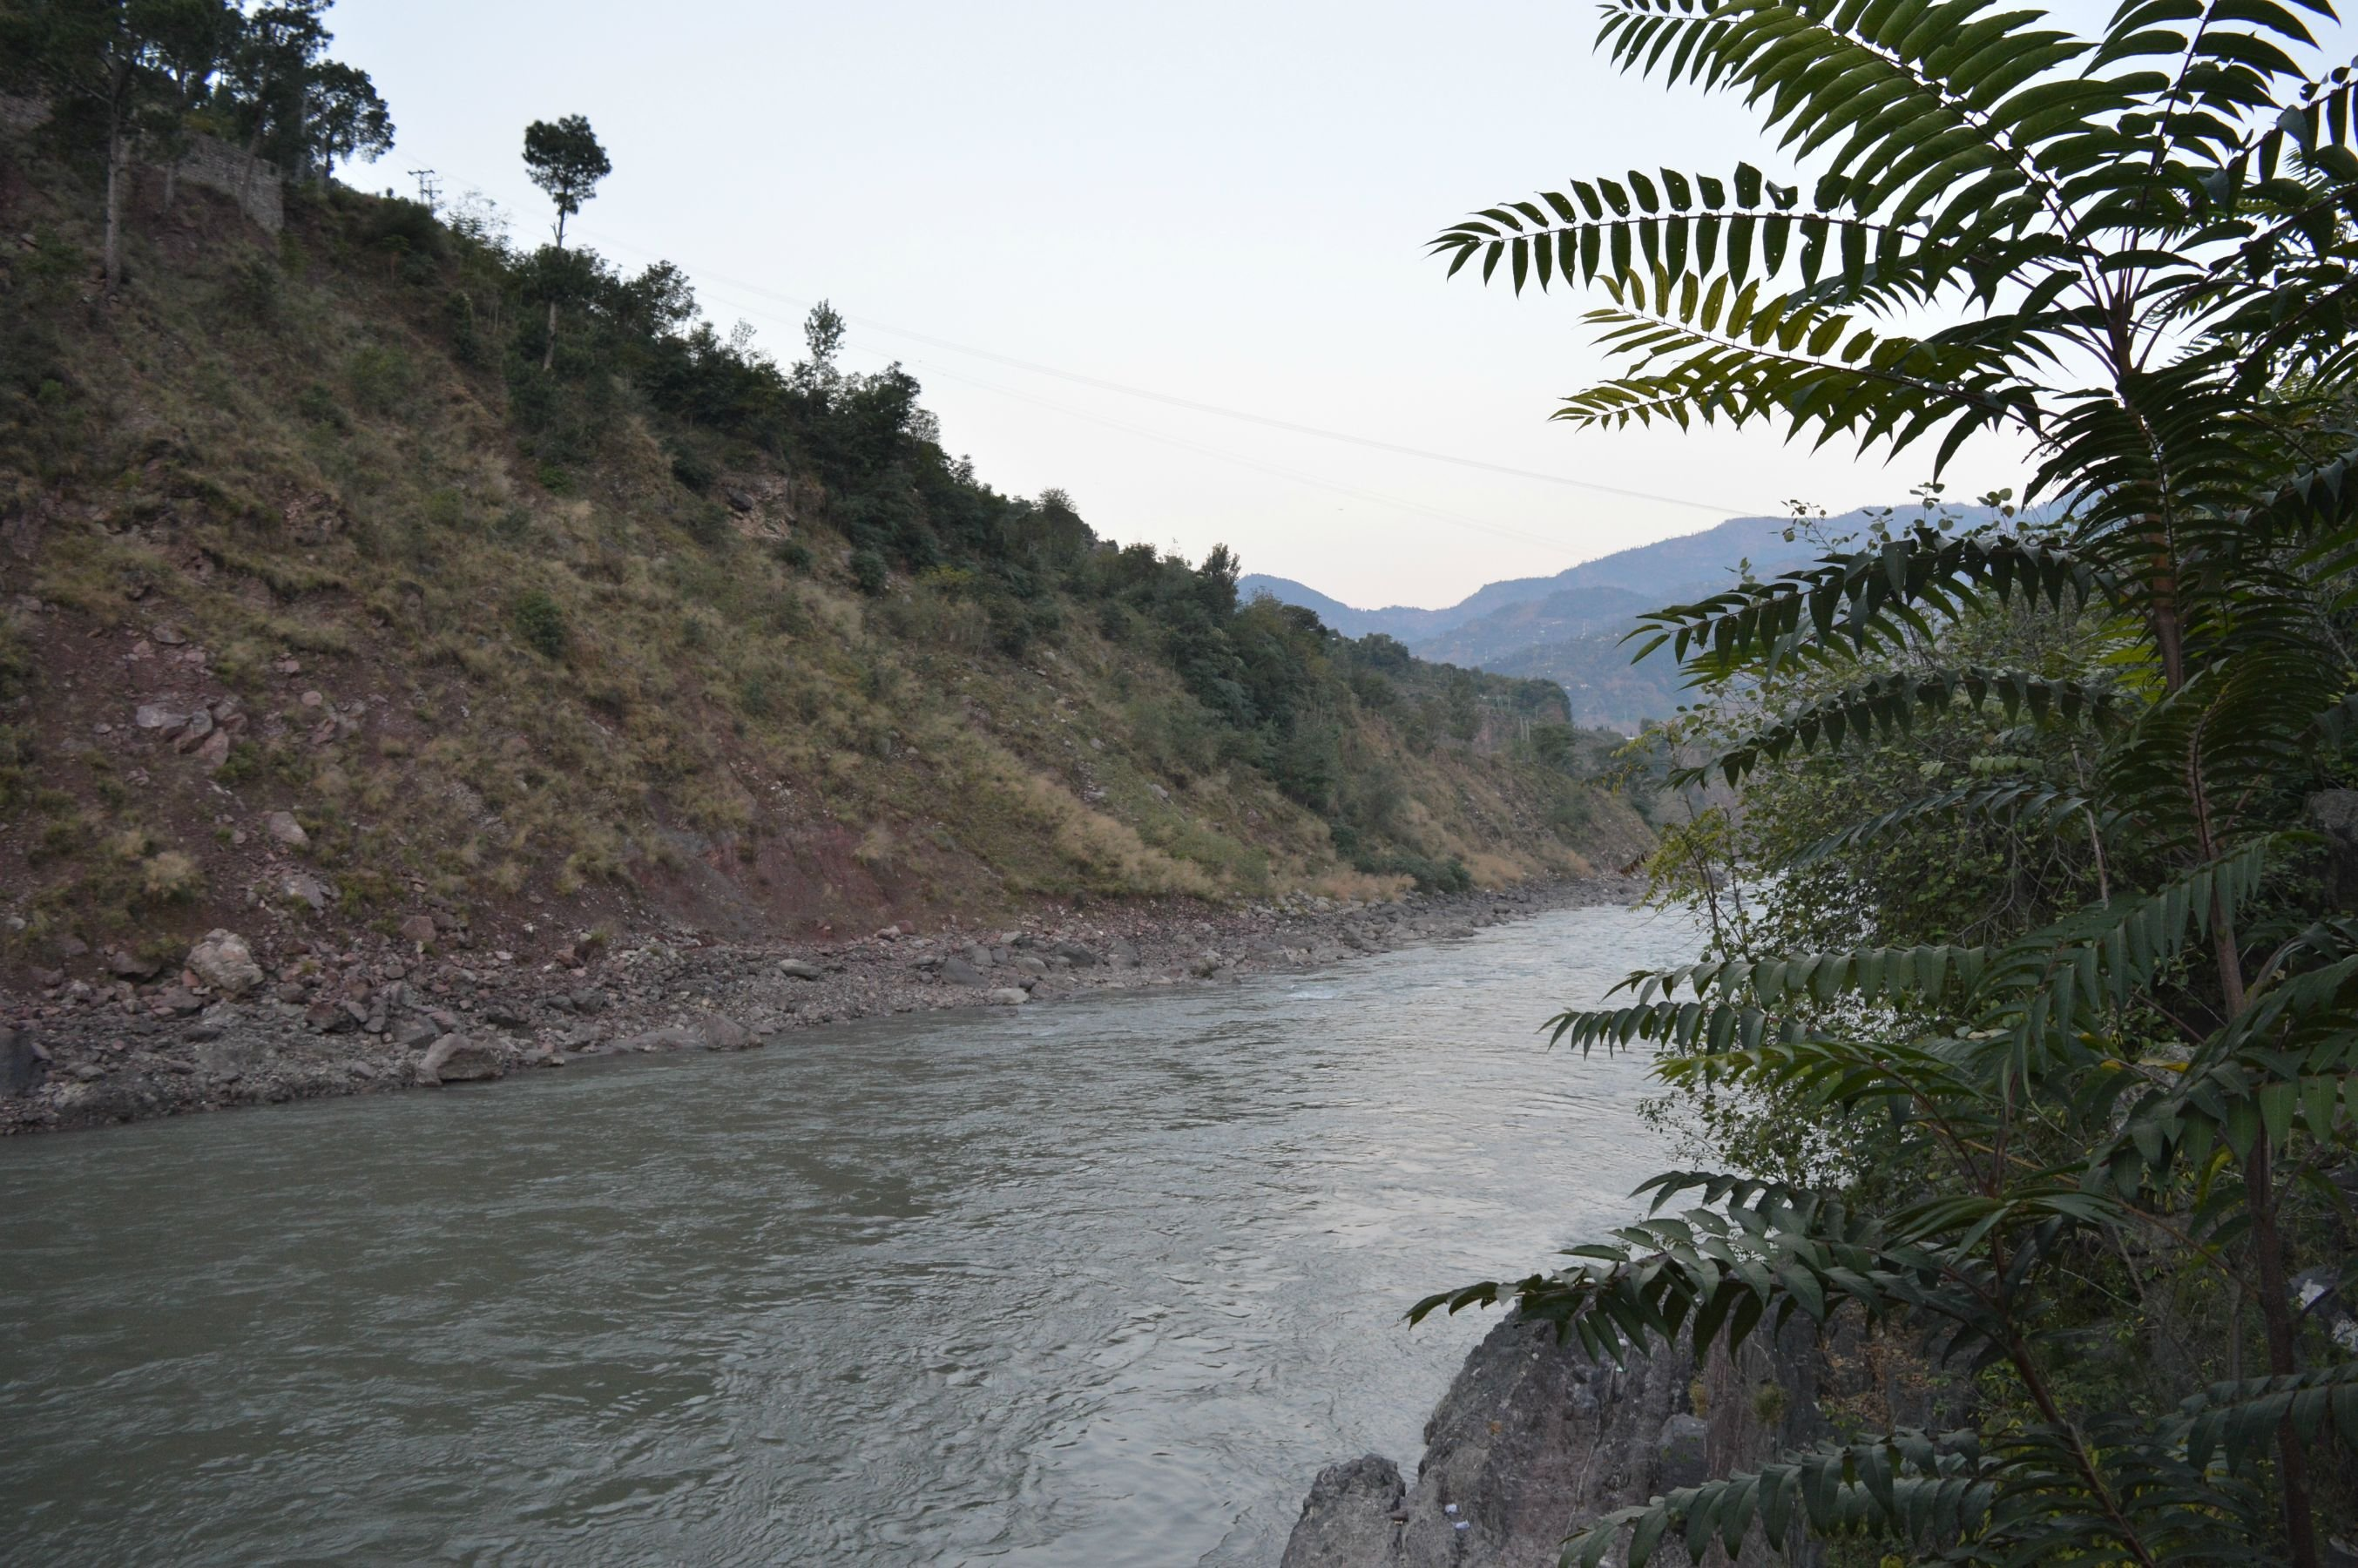 neelum river hd free - photo #8